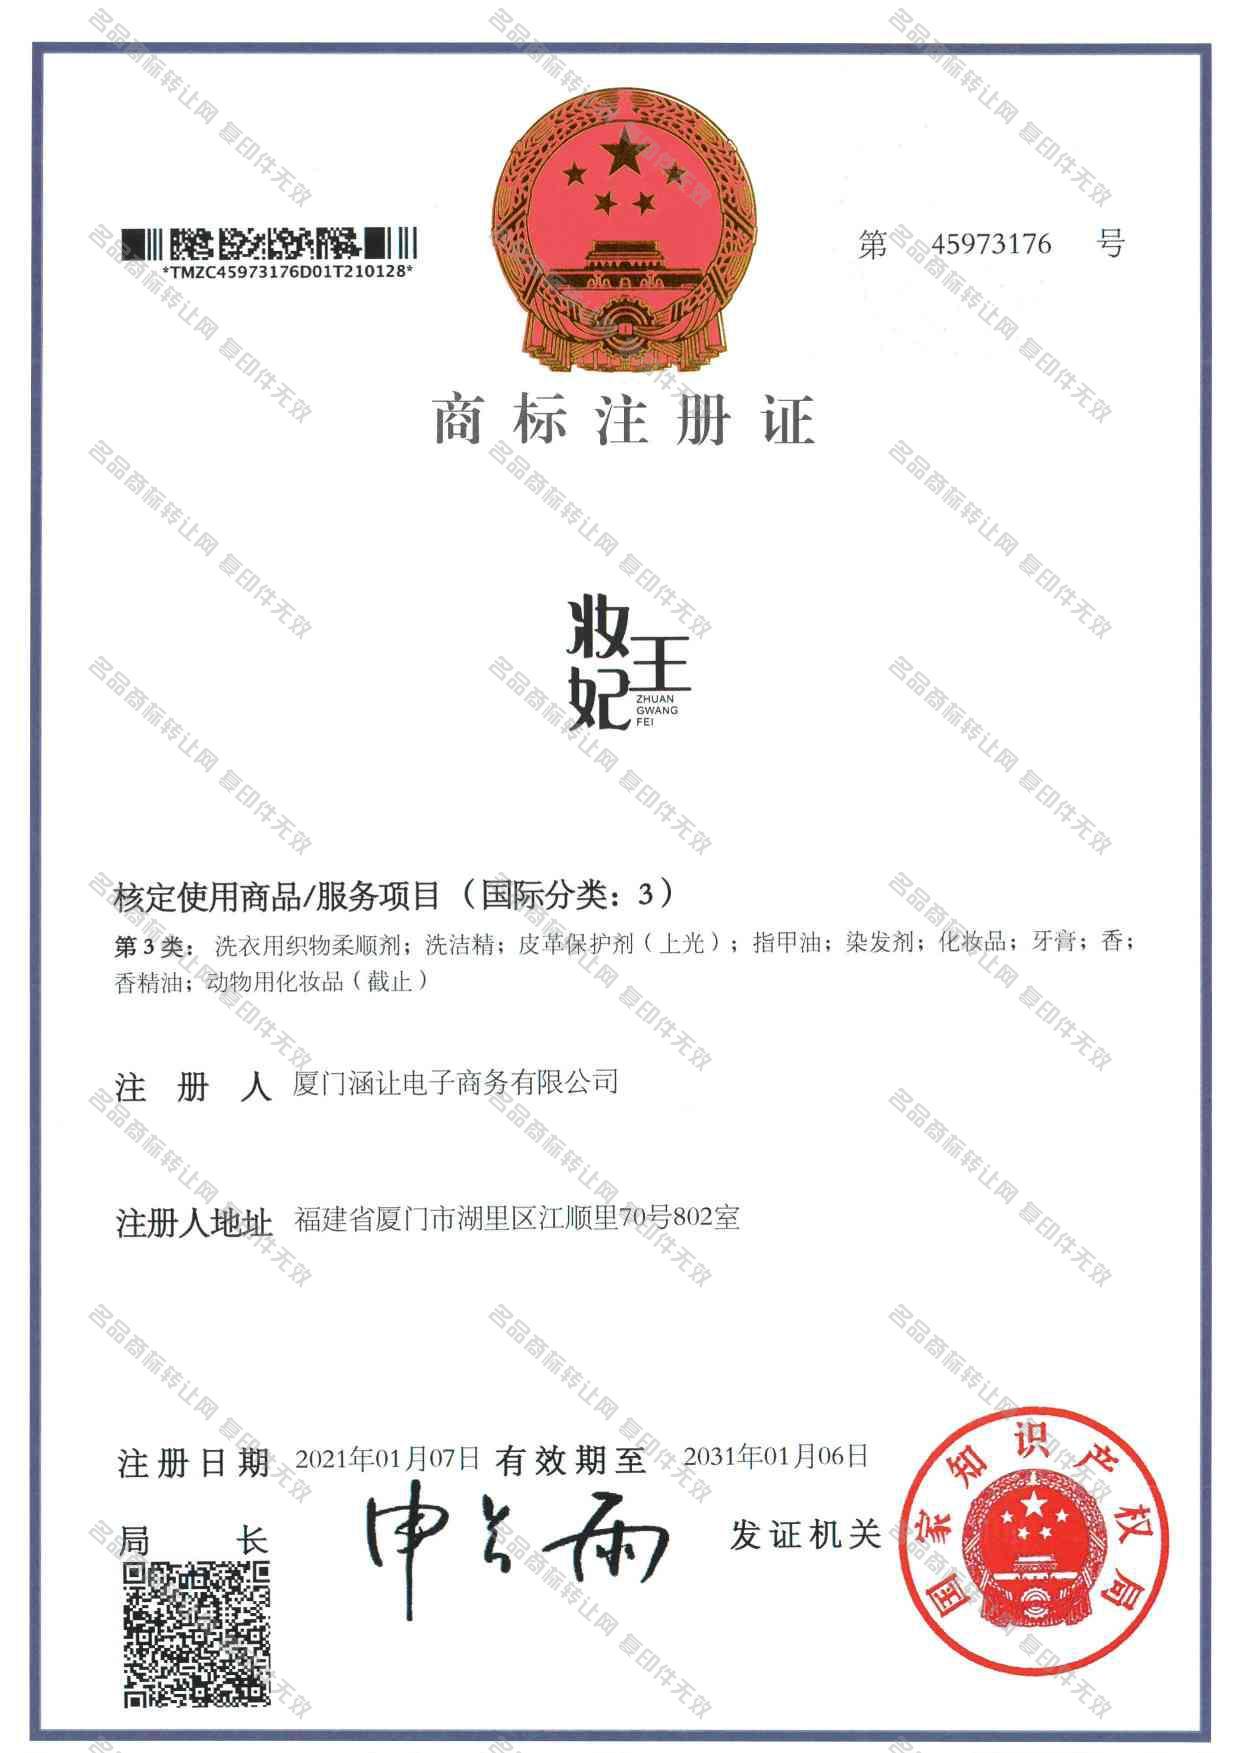 妆王妃;ZHUANGWANGFEI注册证